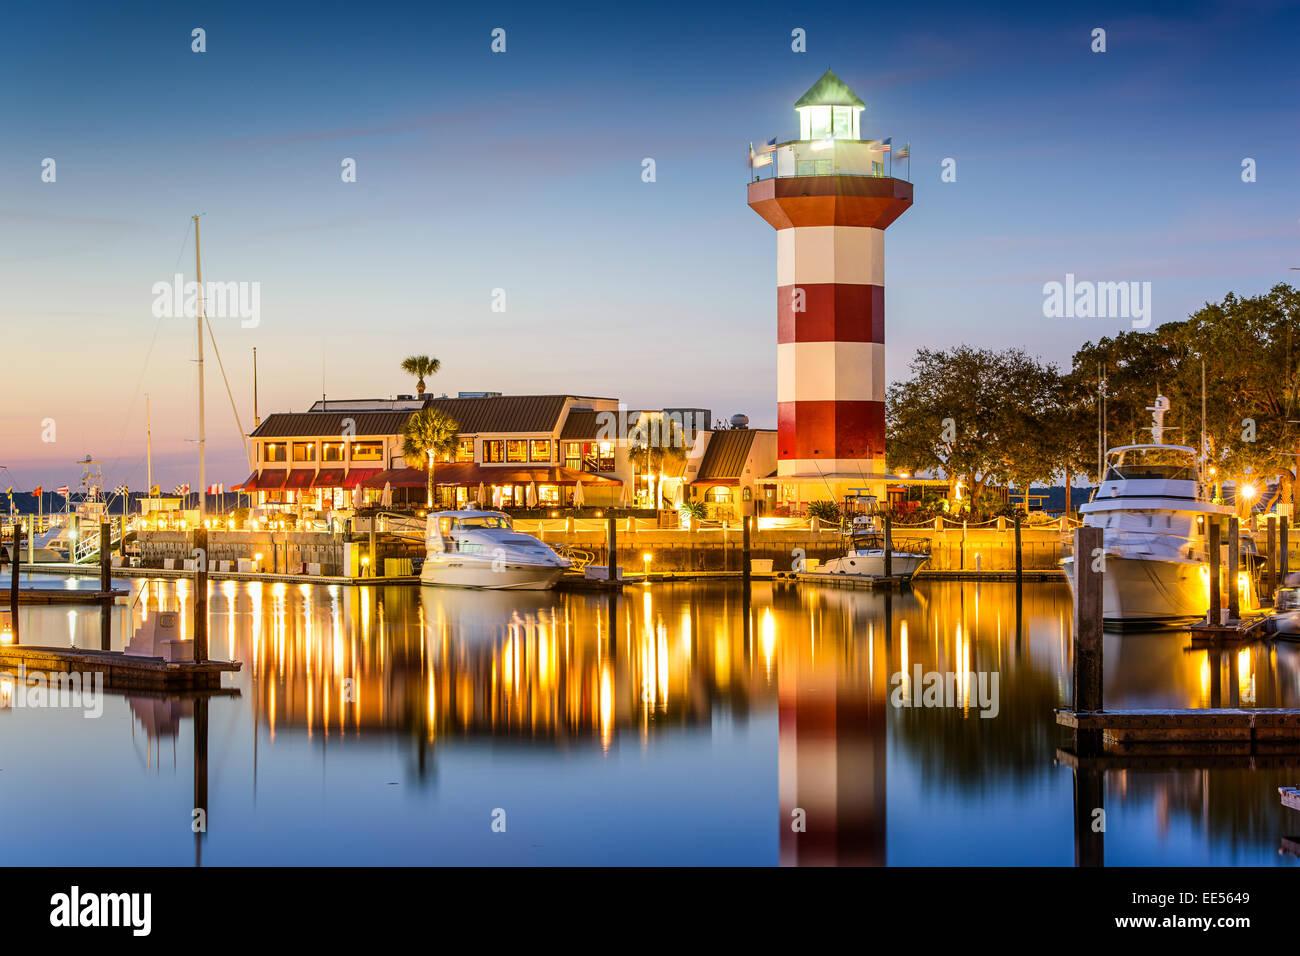 Hilton Head, South Carolina, lighthouse at twilight. - Stock Image